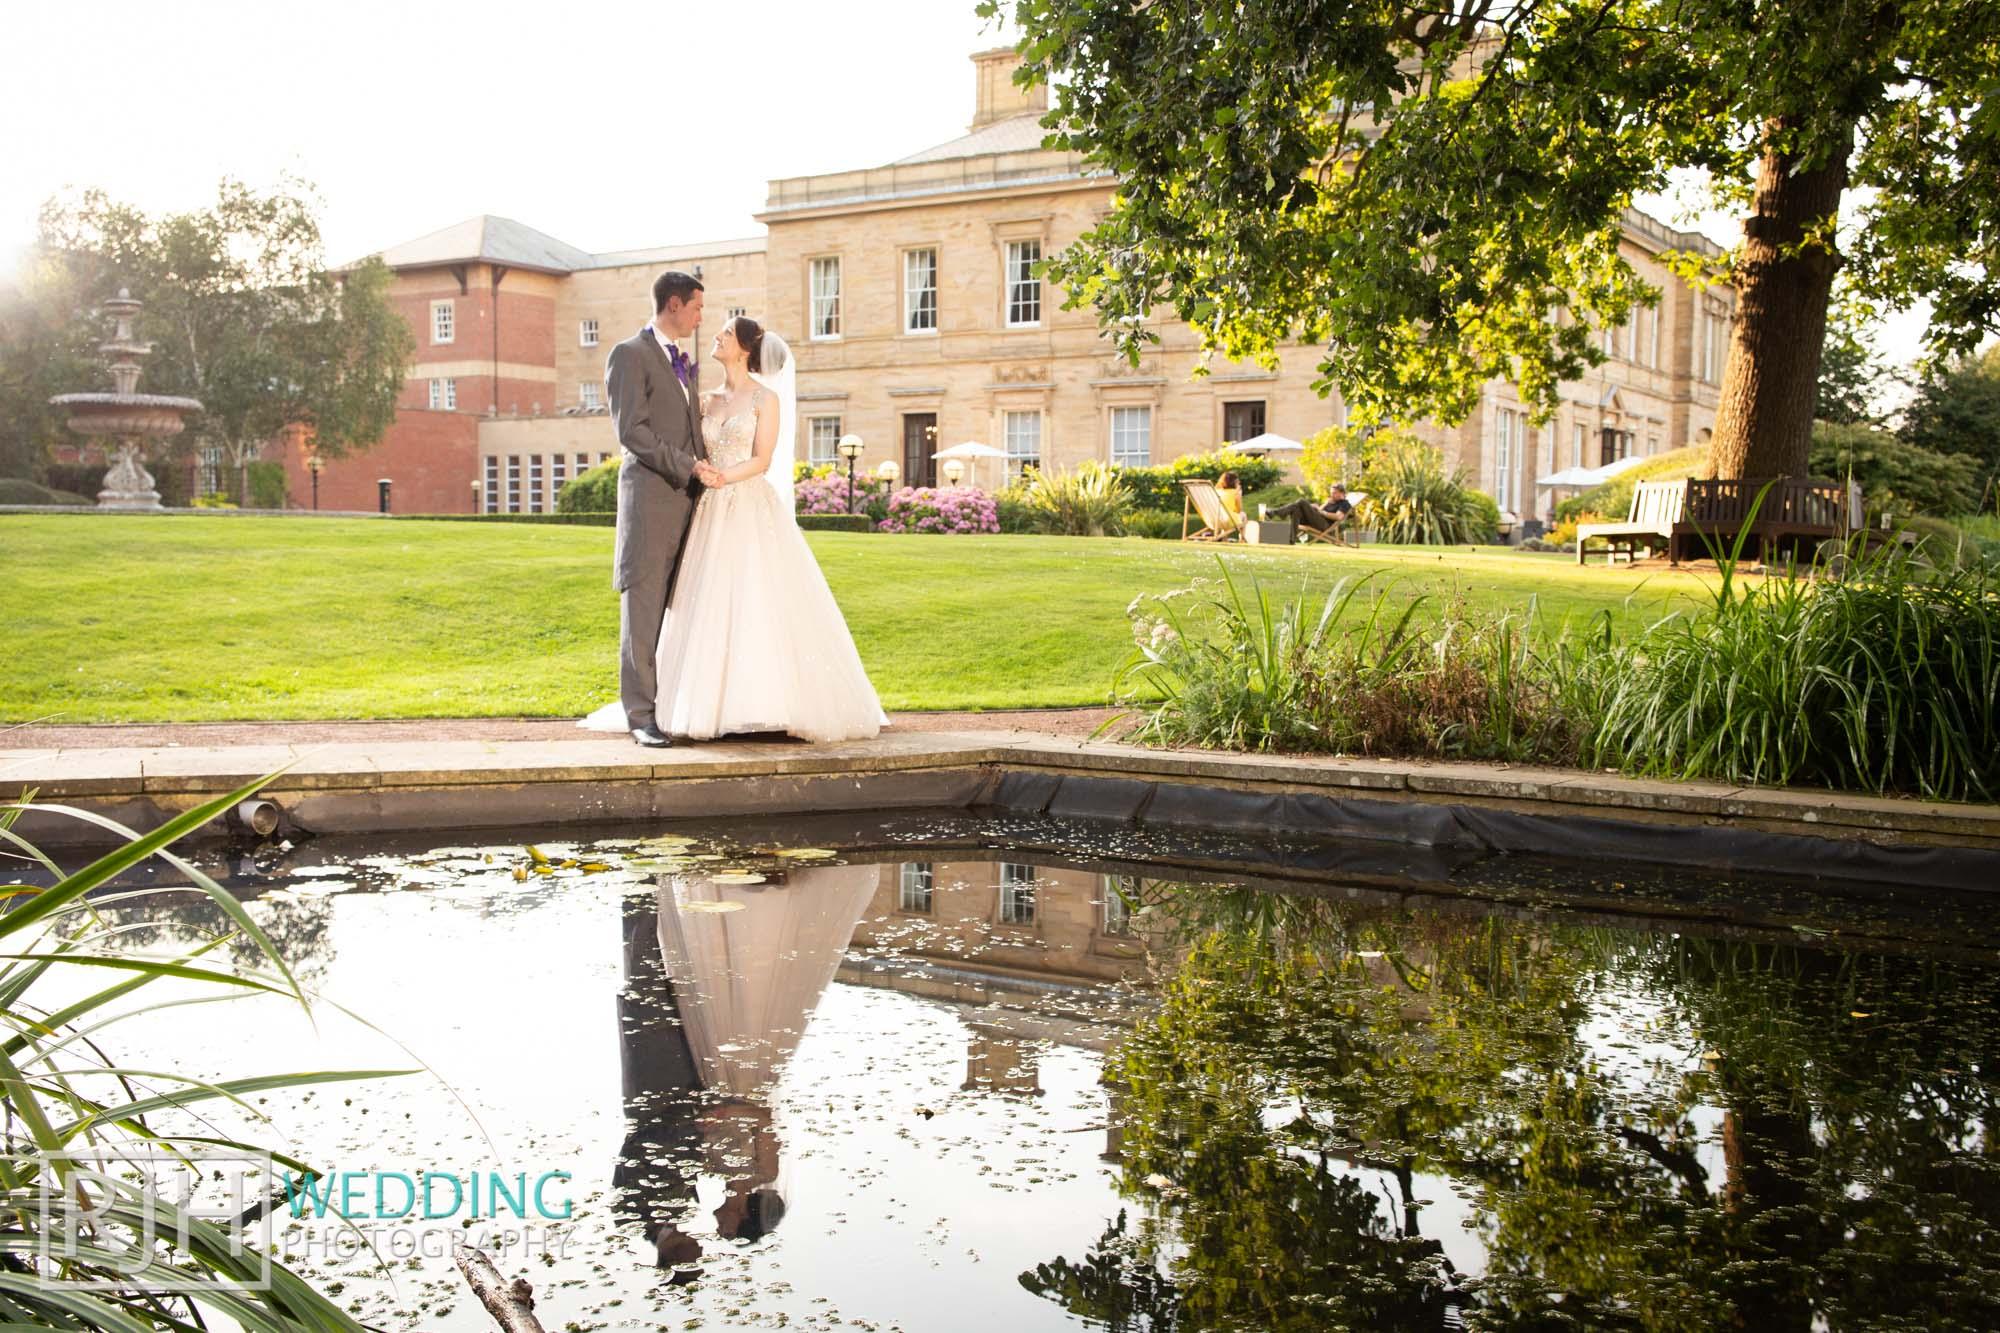 Oulton Hall Wedding Photography_Goodwill-Hall_043_IMG_6841.jpg